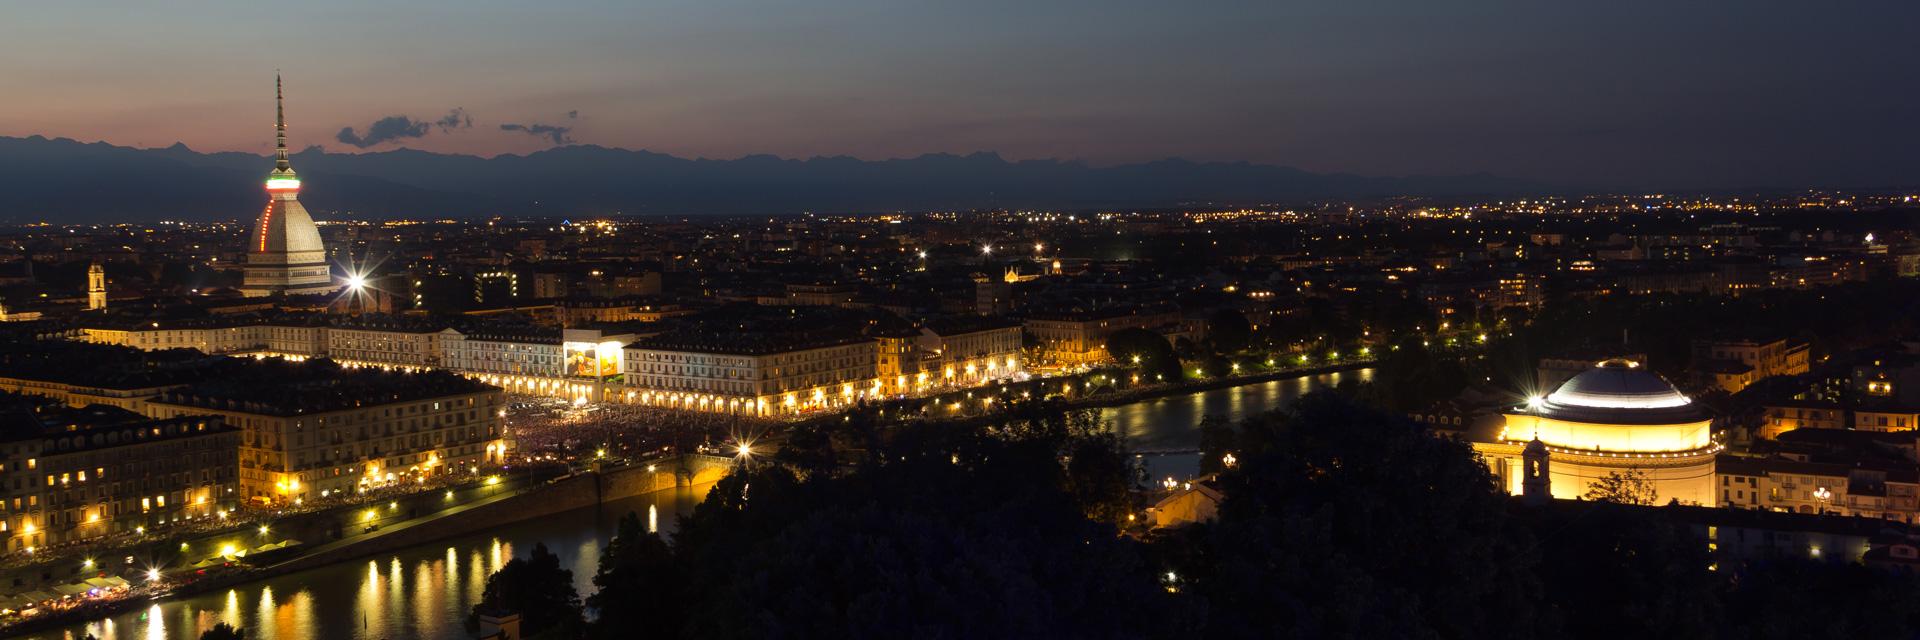 Torino foto di Daniele Iobbi